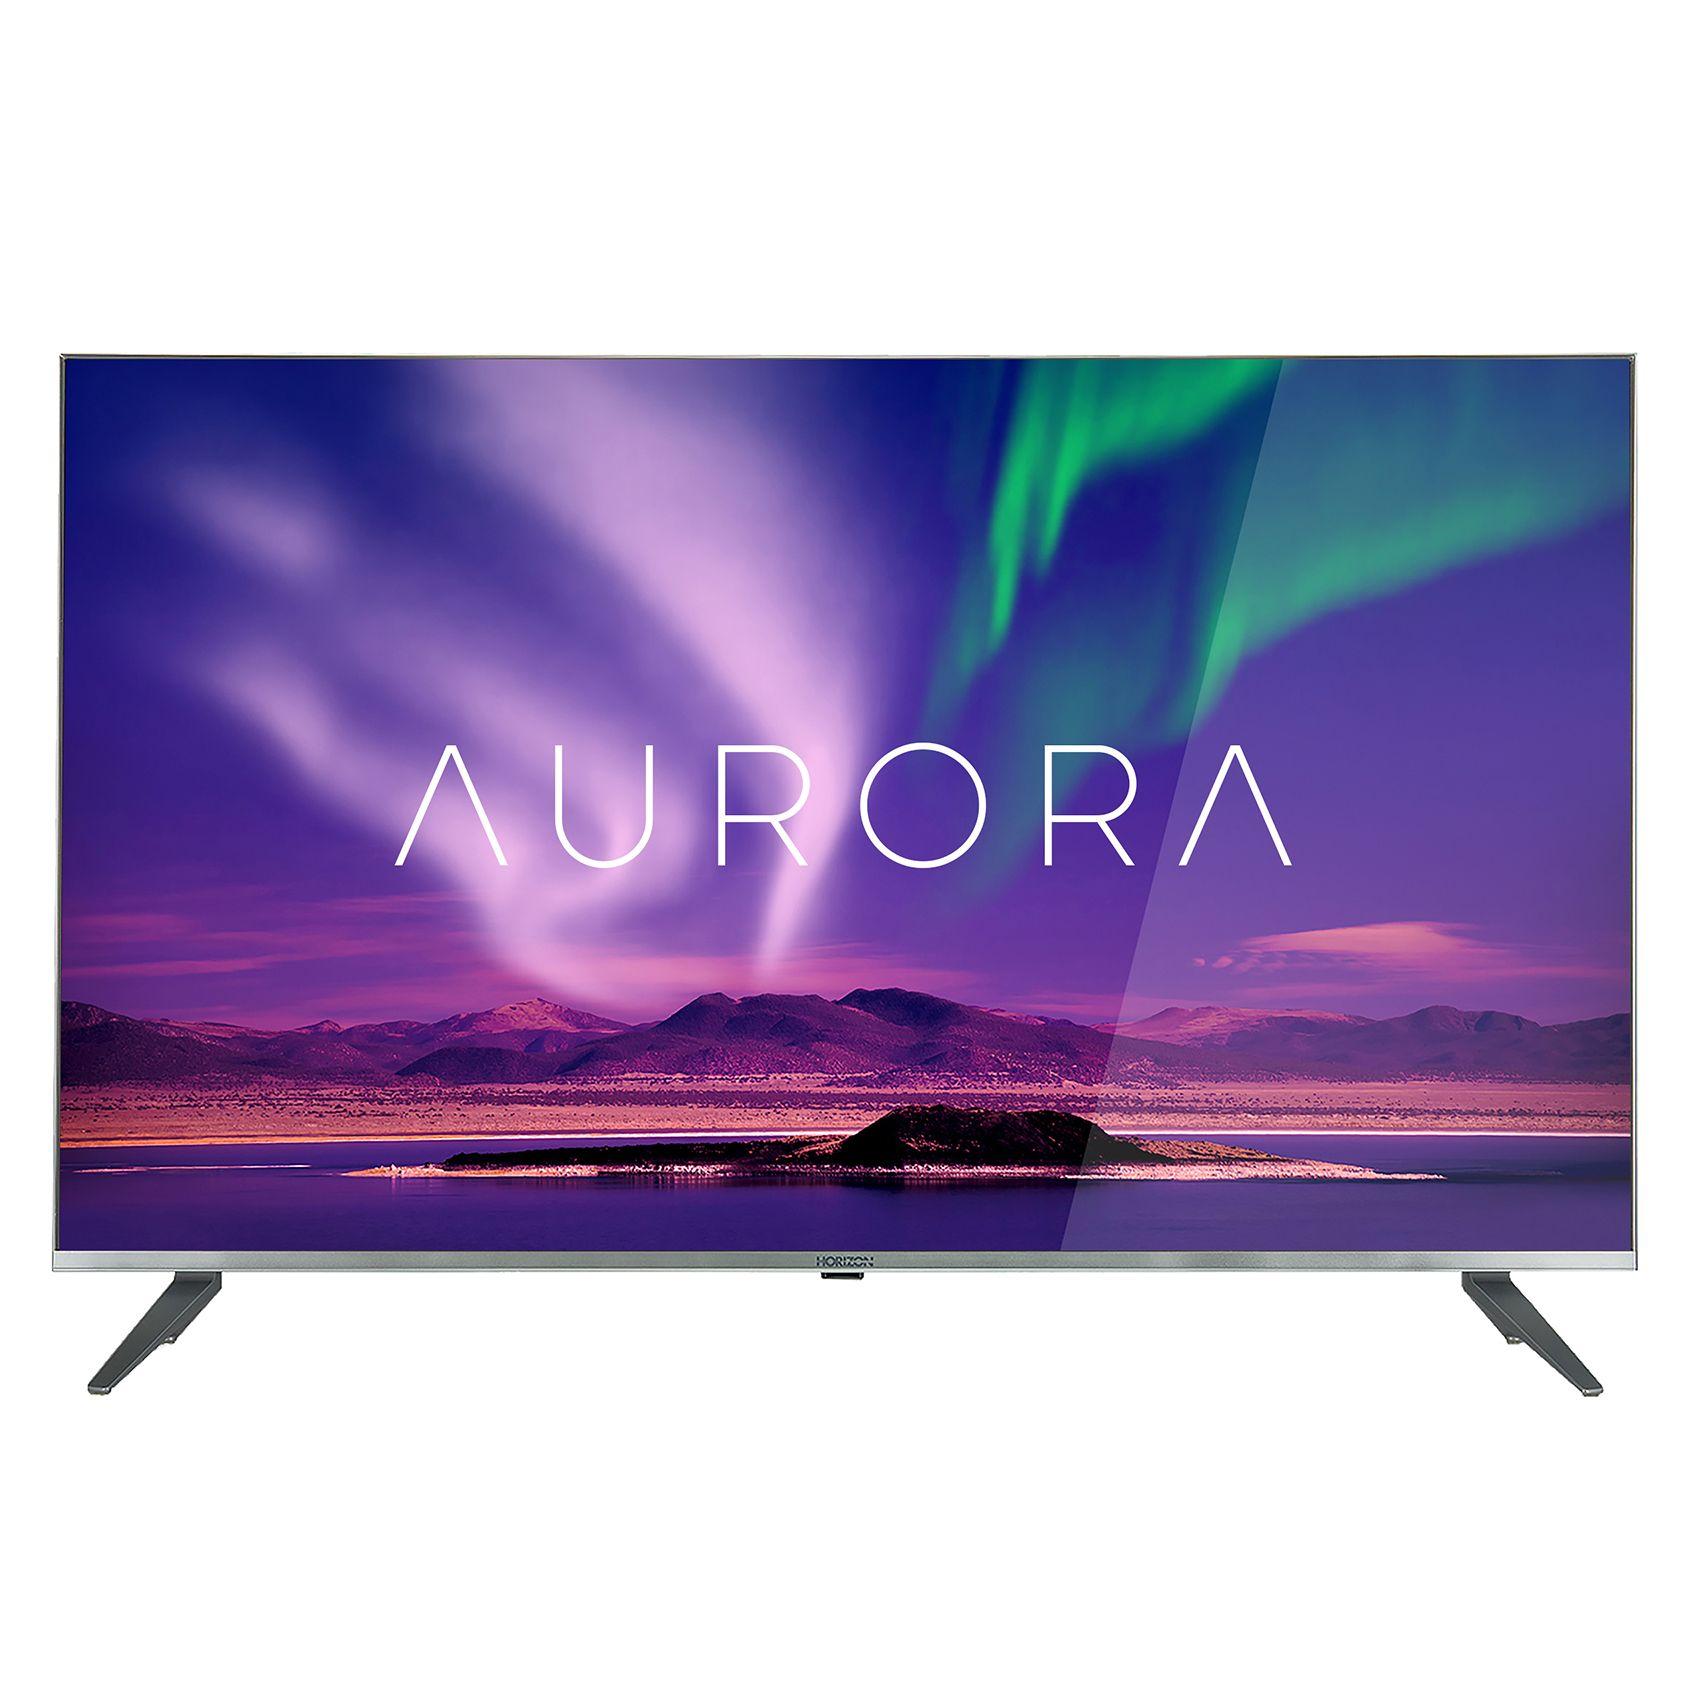 Televizor LED Horizon Smart TV Aurora 49HL9910U 124cm 4K Ultra HD Argintiu